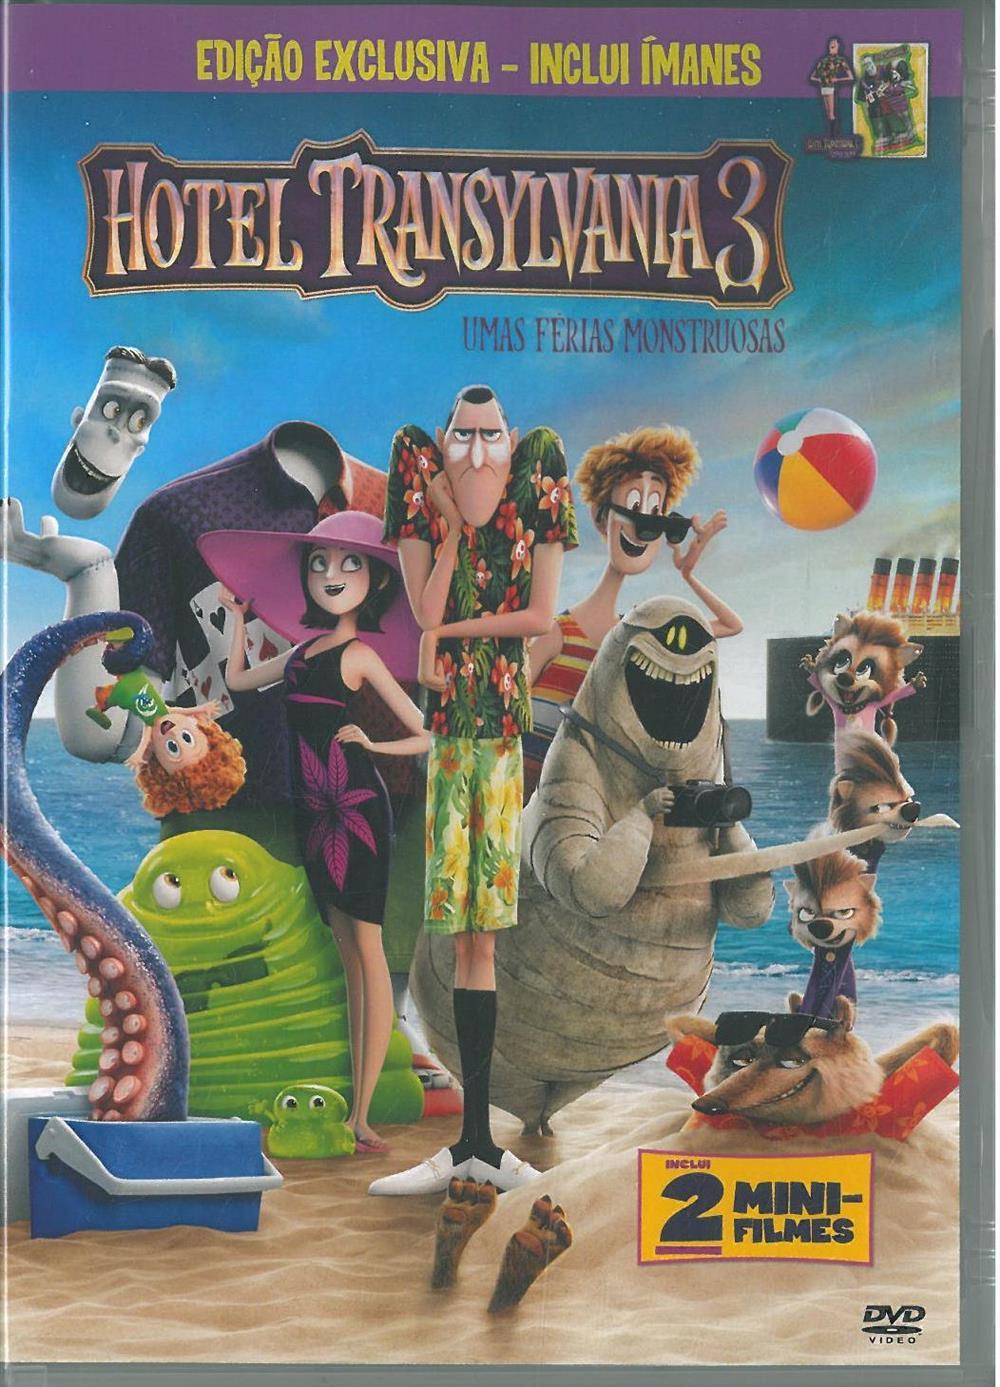 Hotal Transylvania 3_DVD.jpg